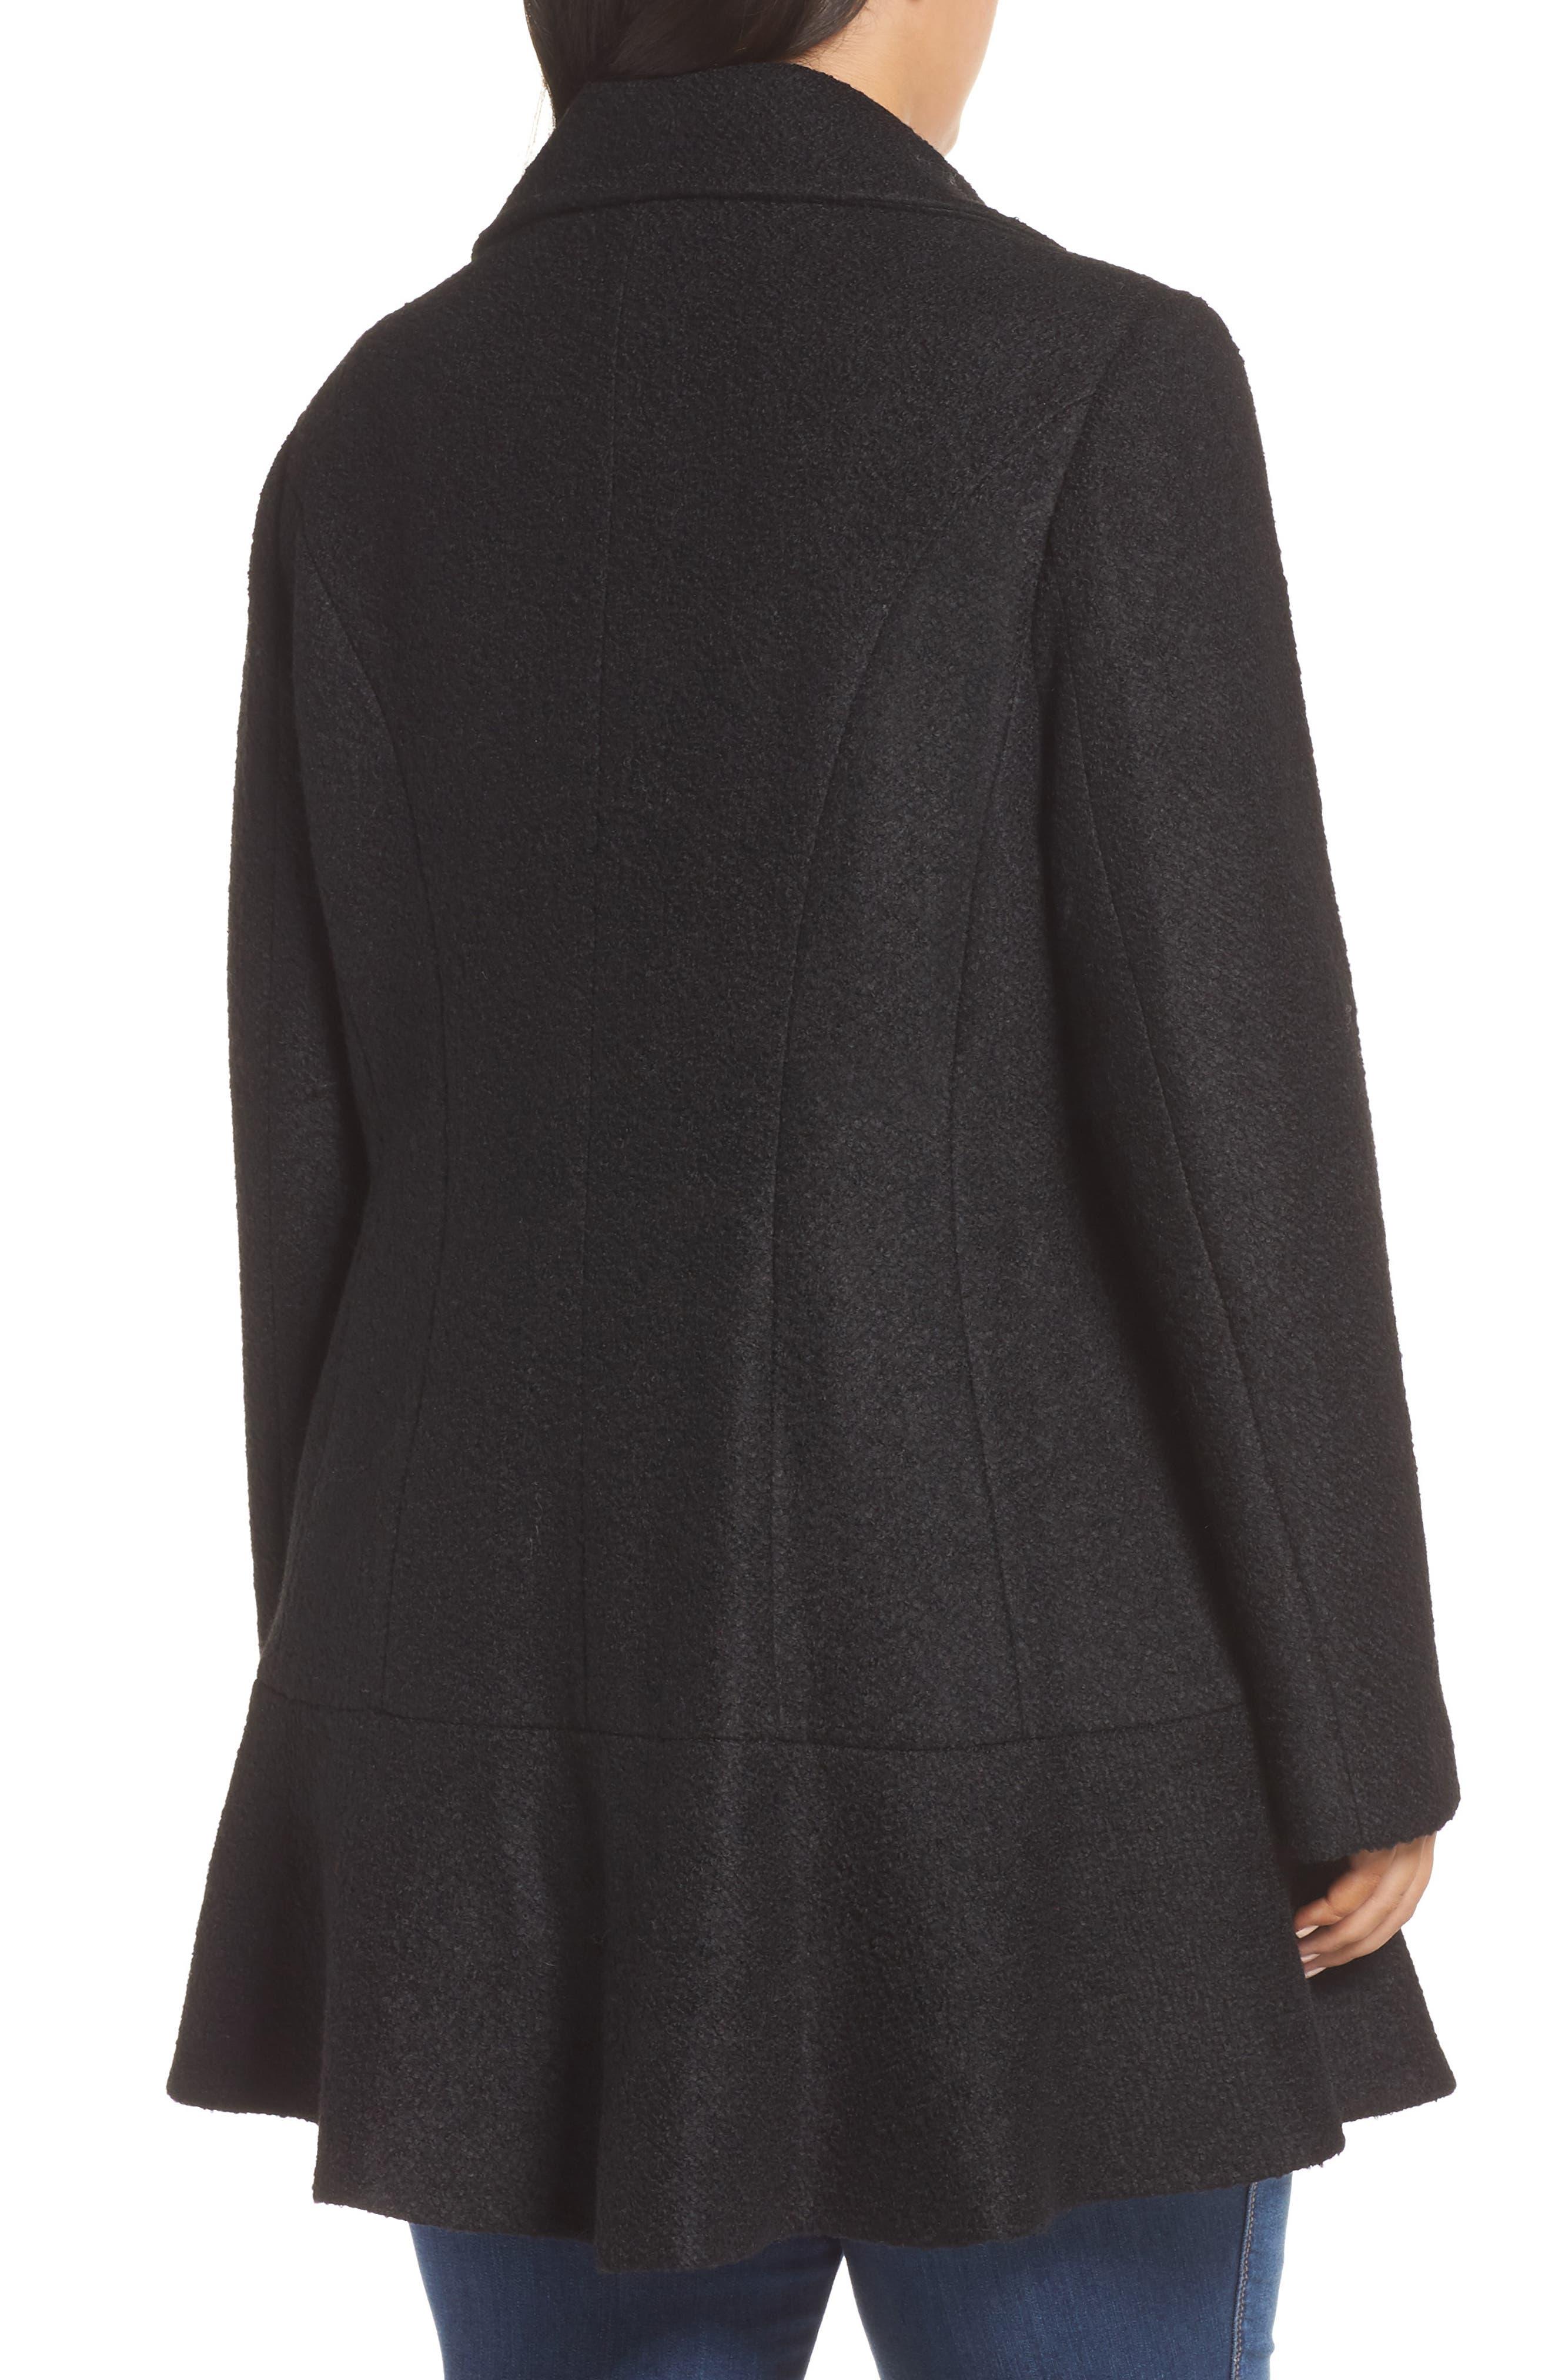 KENSIE, Notch Lapel Peplum Coat, Alternate thumbnail 2, color, BLACK